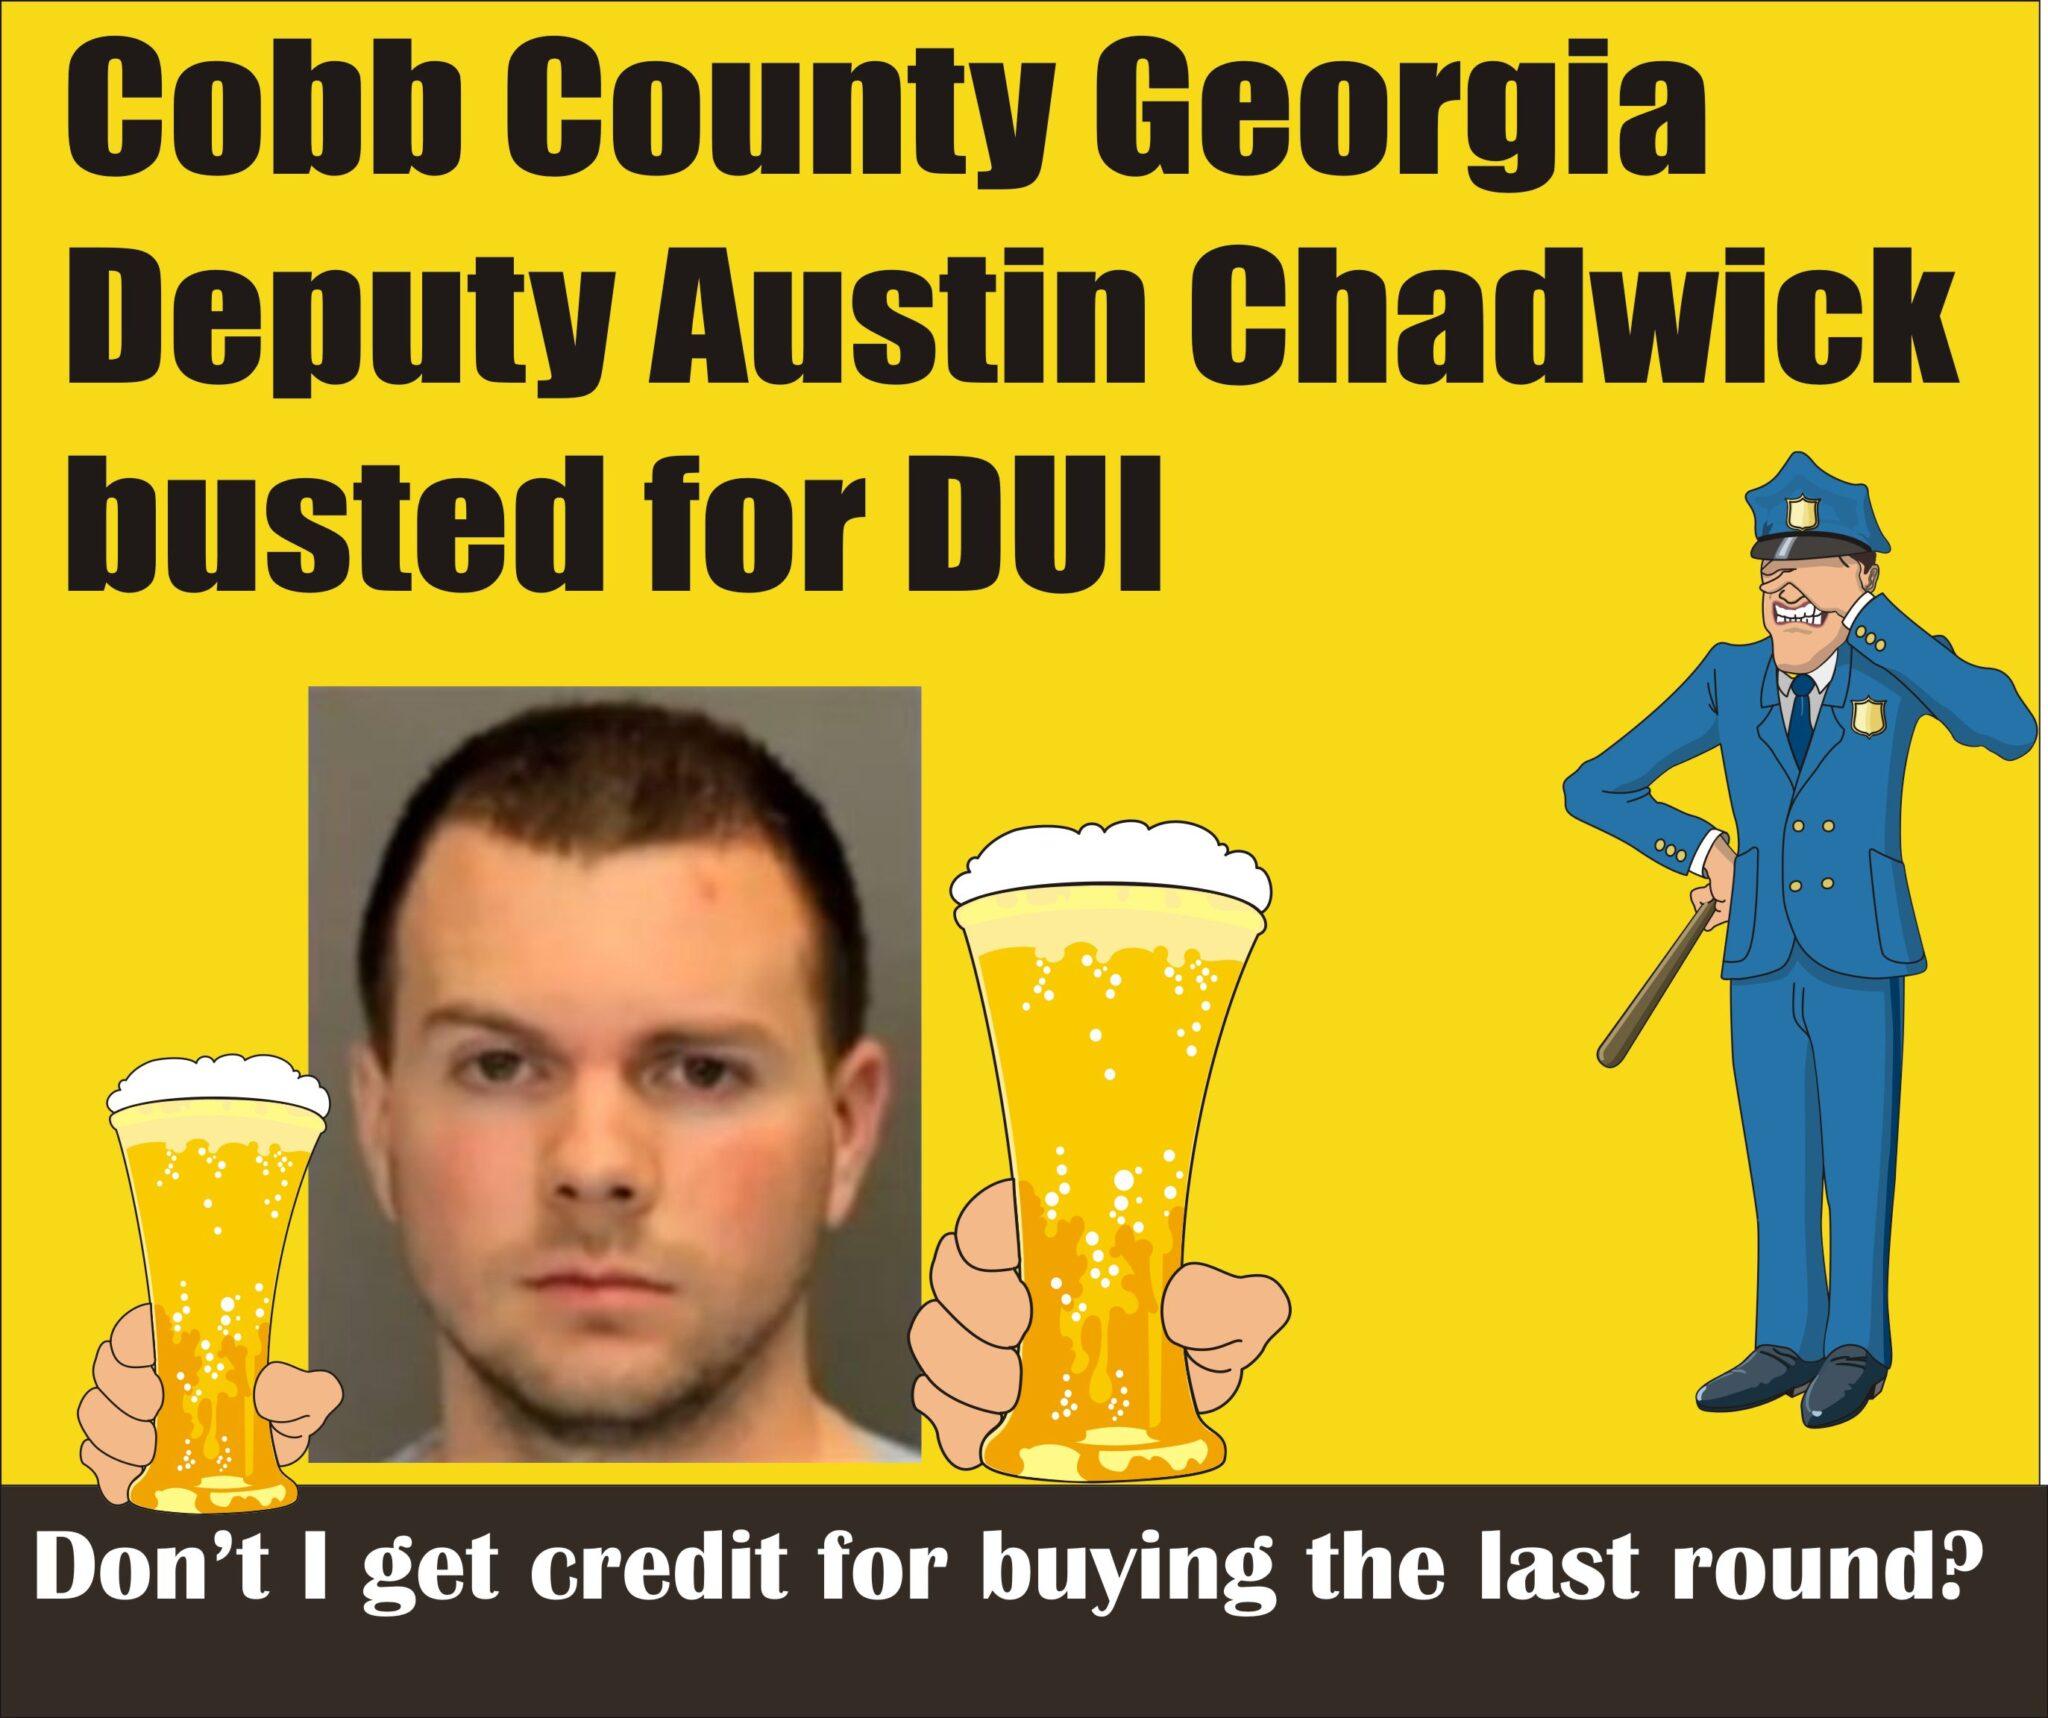 Georgia: Cobb County Sheriff Deputy Austin Chadwick charged with DUI